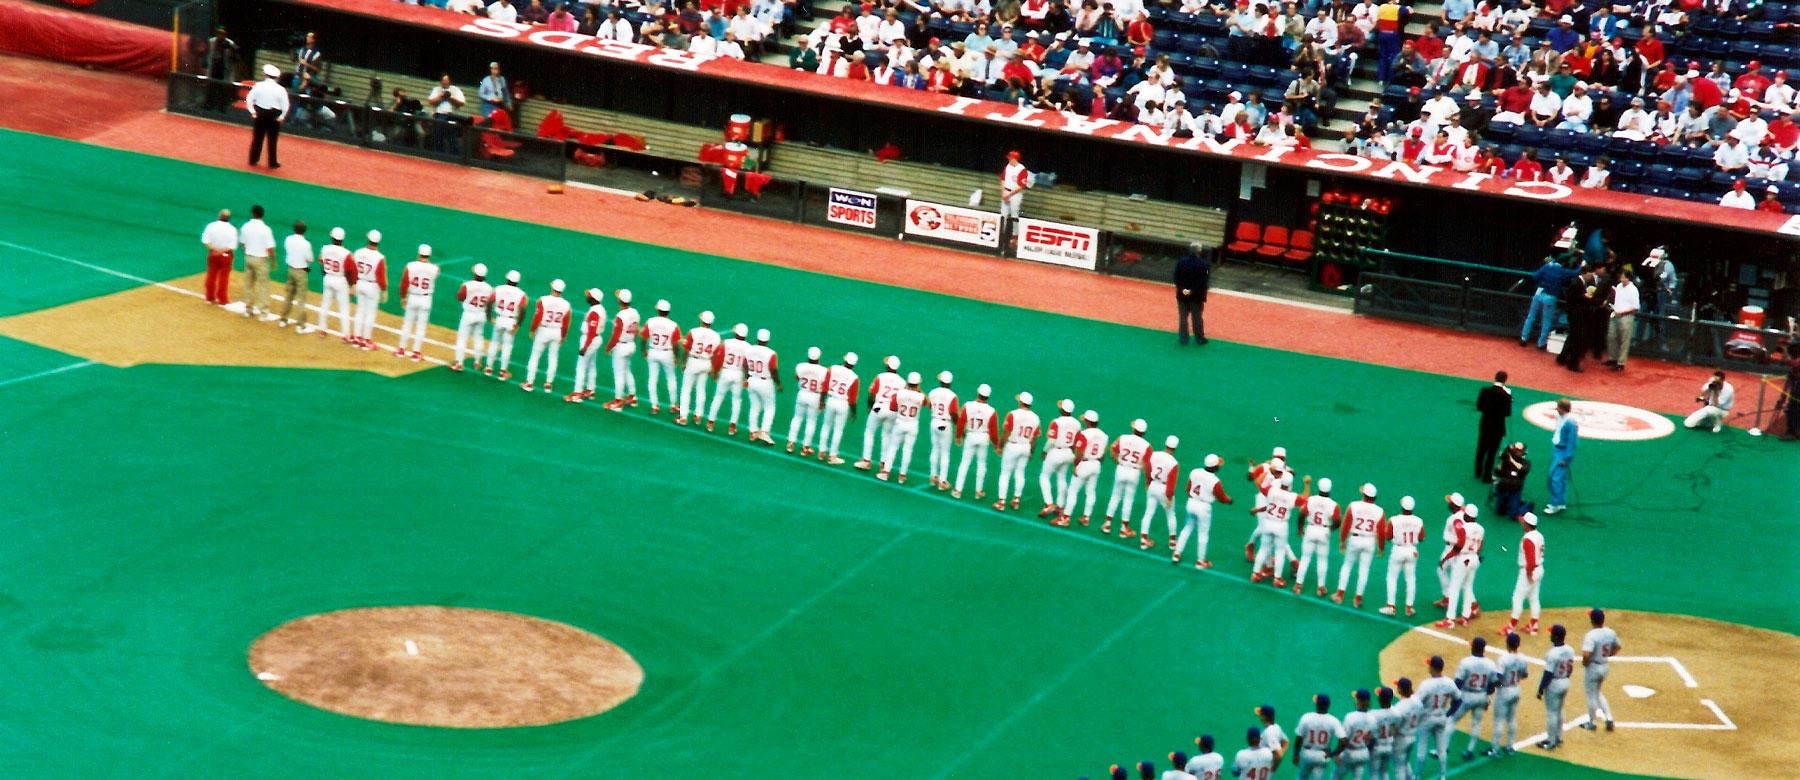 Cincinnati Reds 150 Throwback Uniforms - 1995 Edition - Redleg Nation